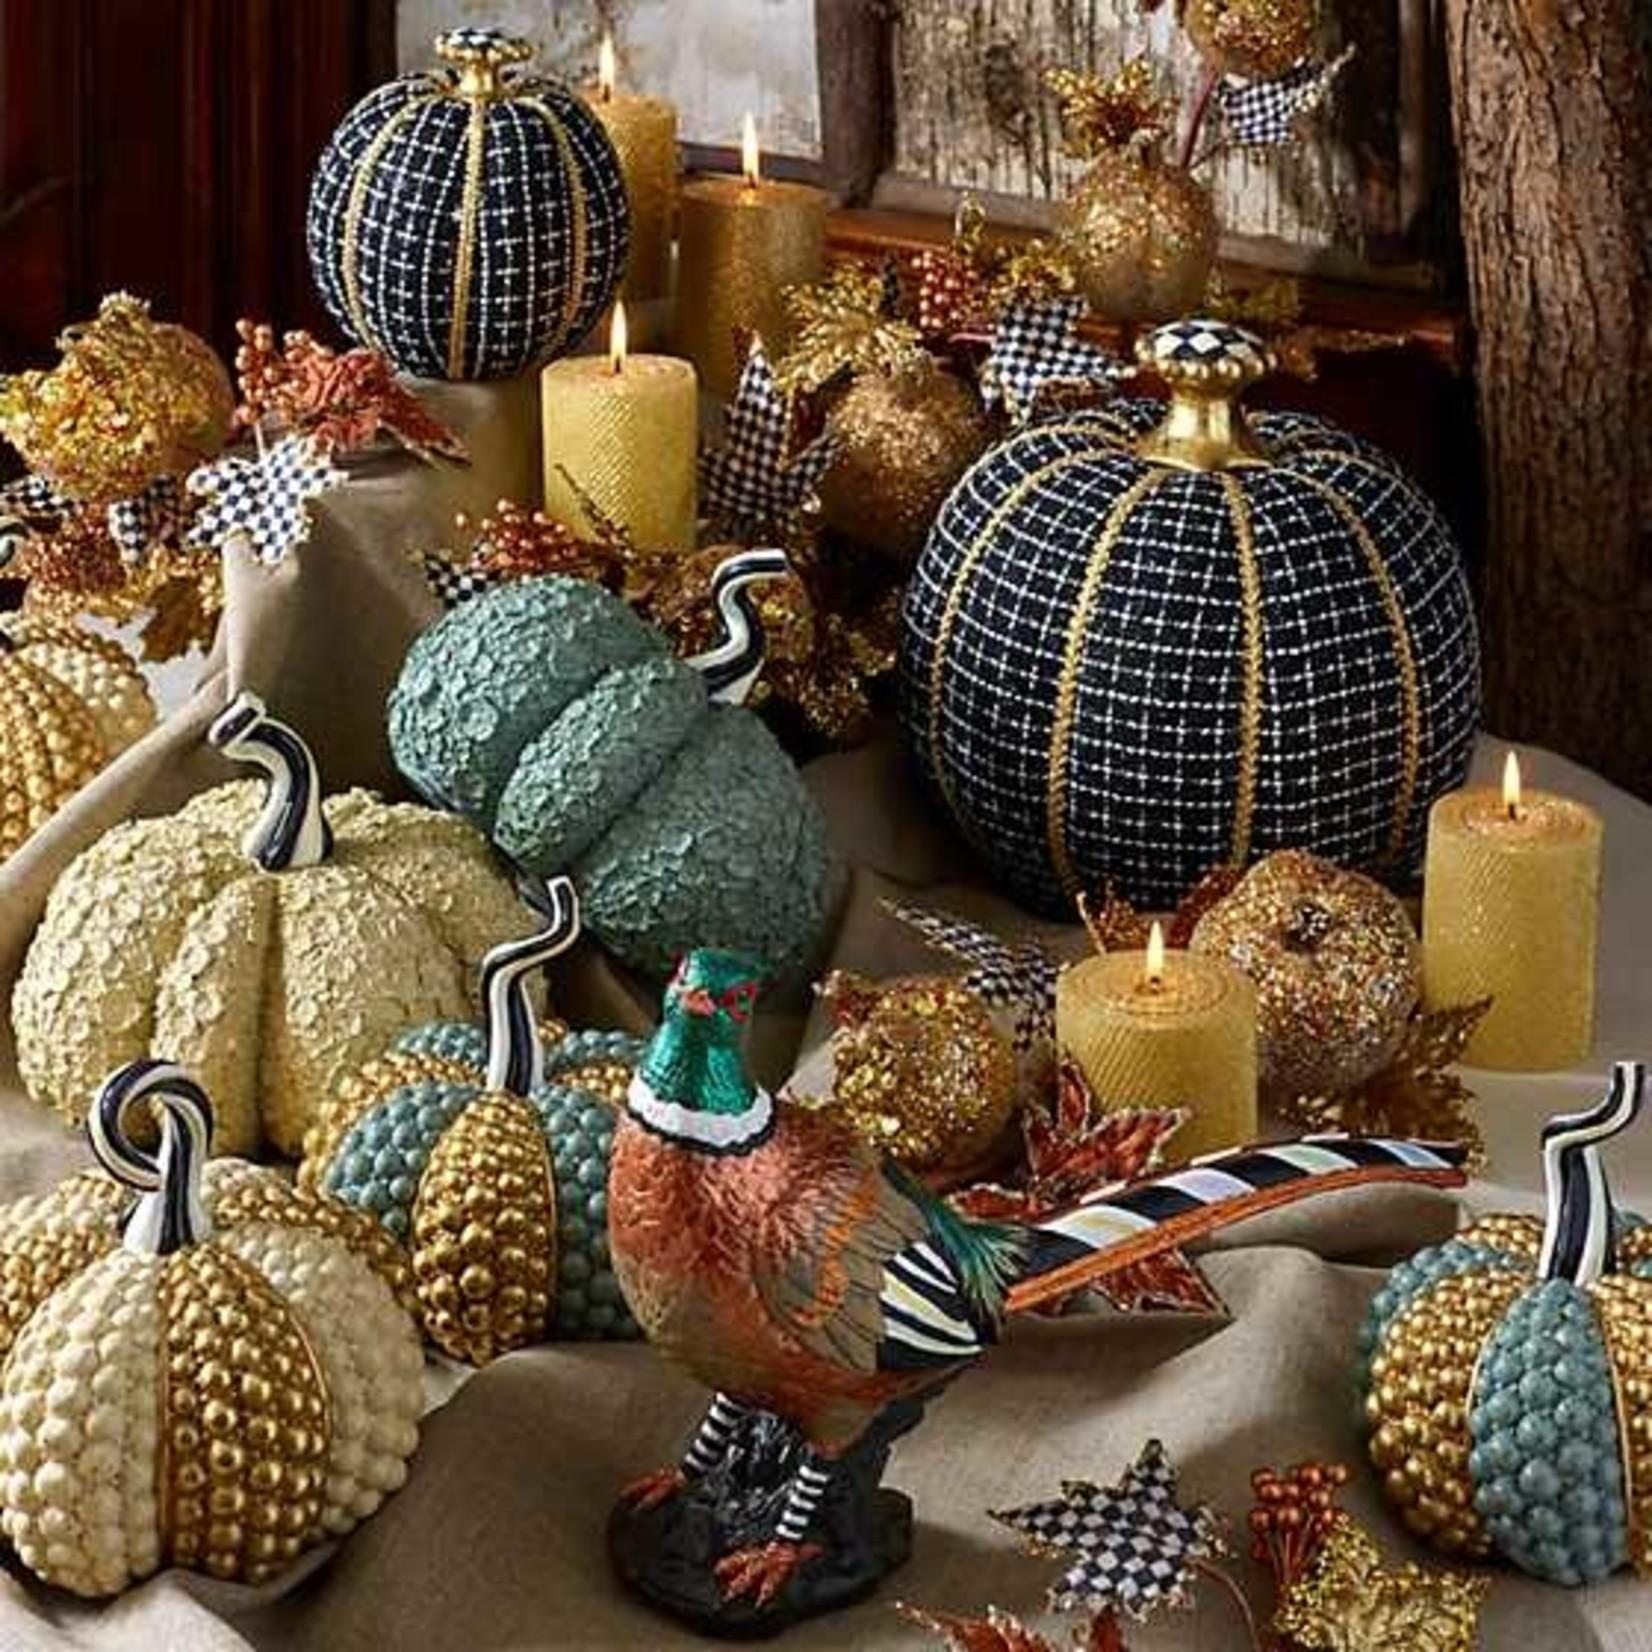 MacKenzie Childs Autumn Harvest Pumpkin - Ivory Jewel